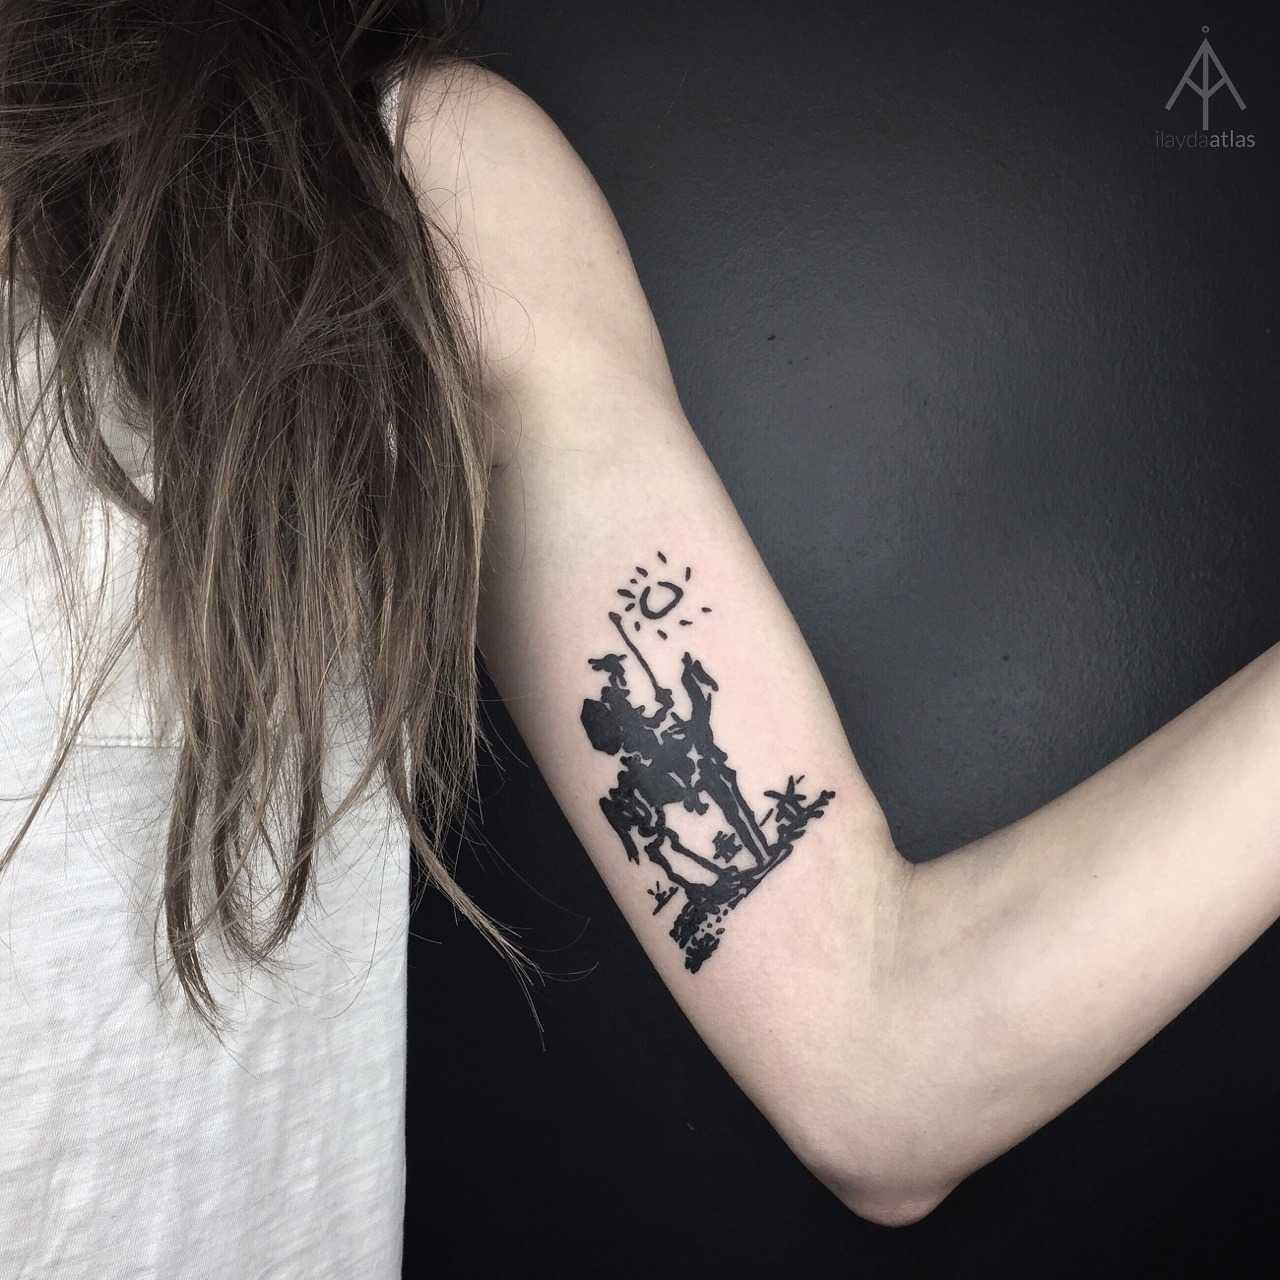 Don Quixote tattoo by Ilayda Atlas